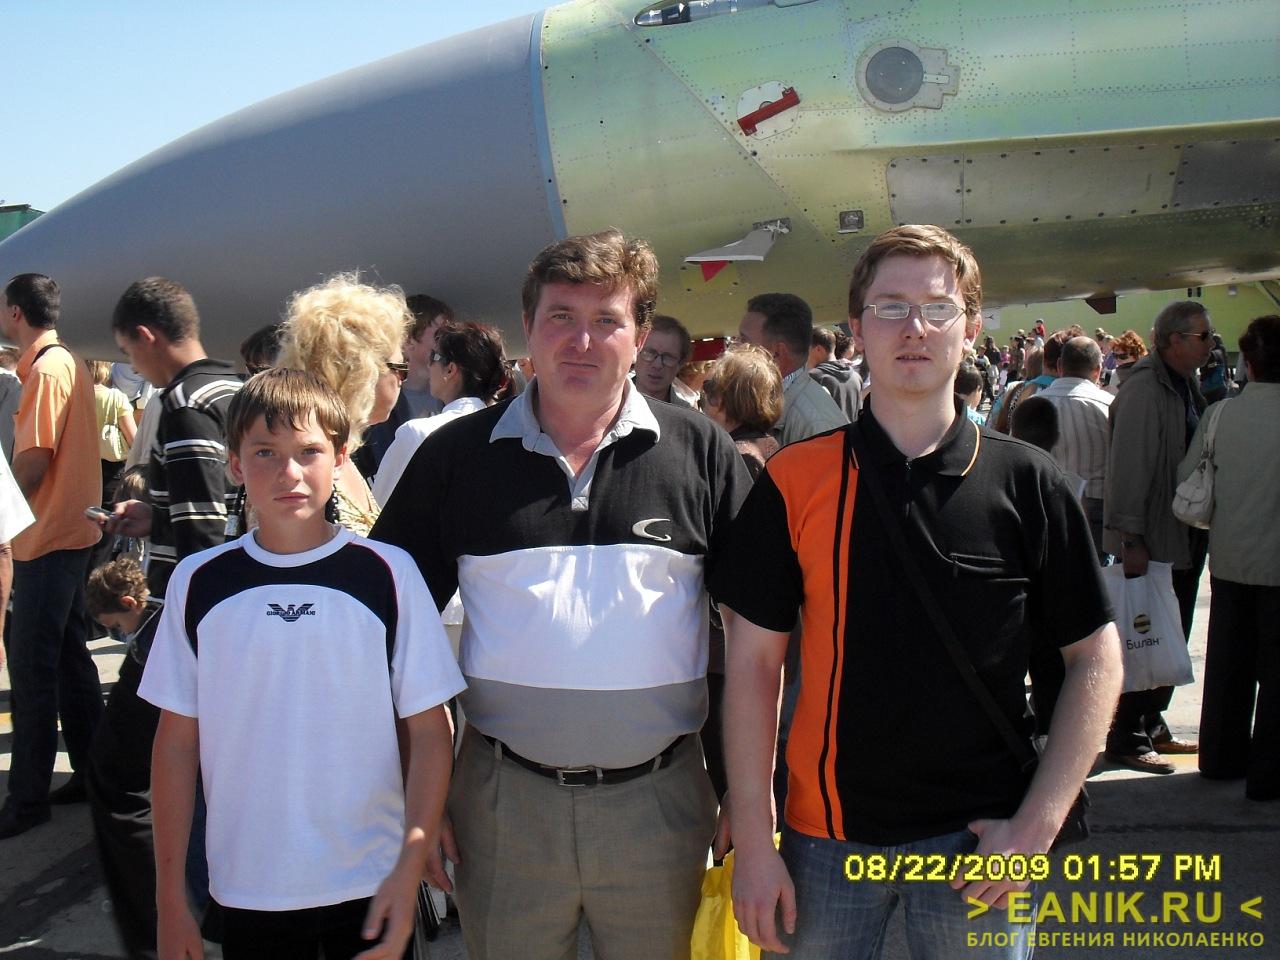 75 лет Иркутскому Авиационному Заводу